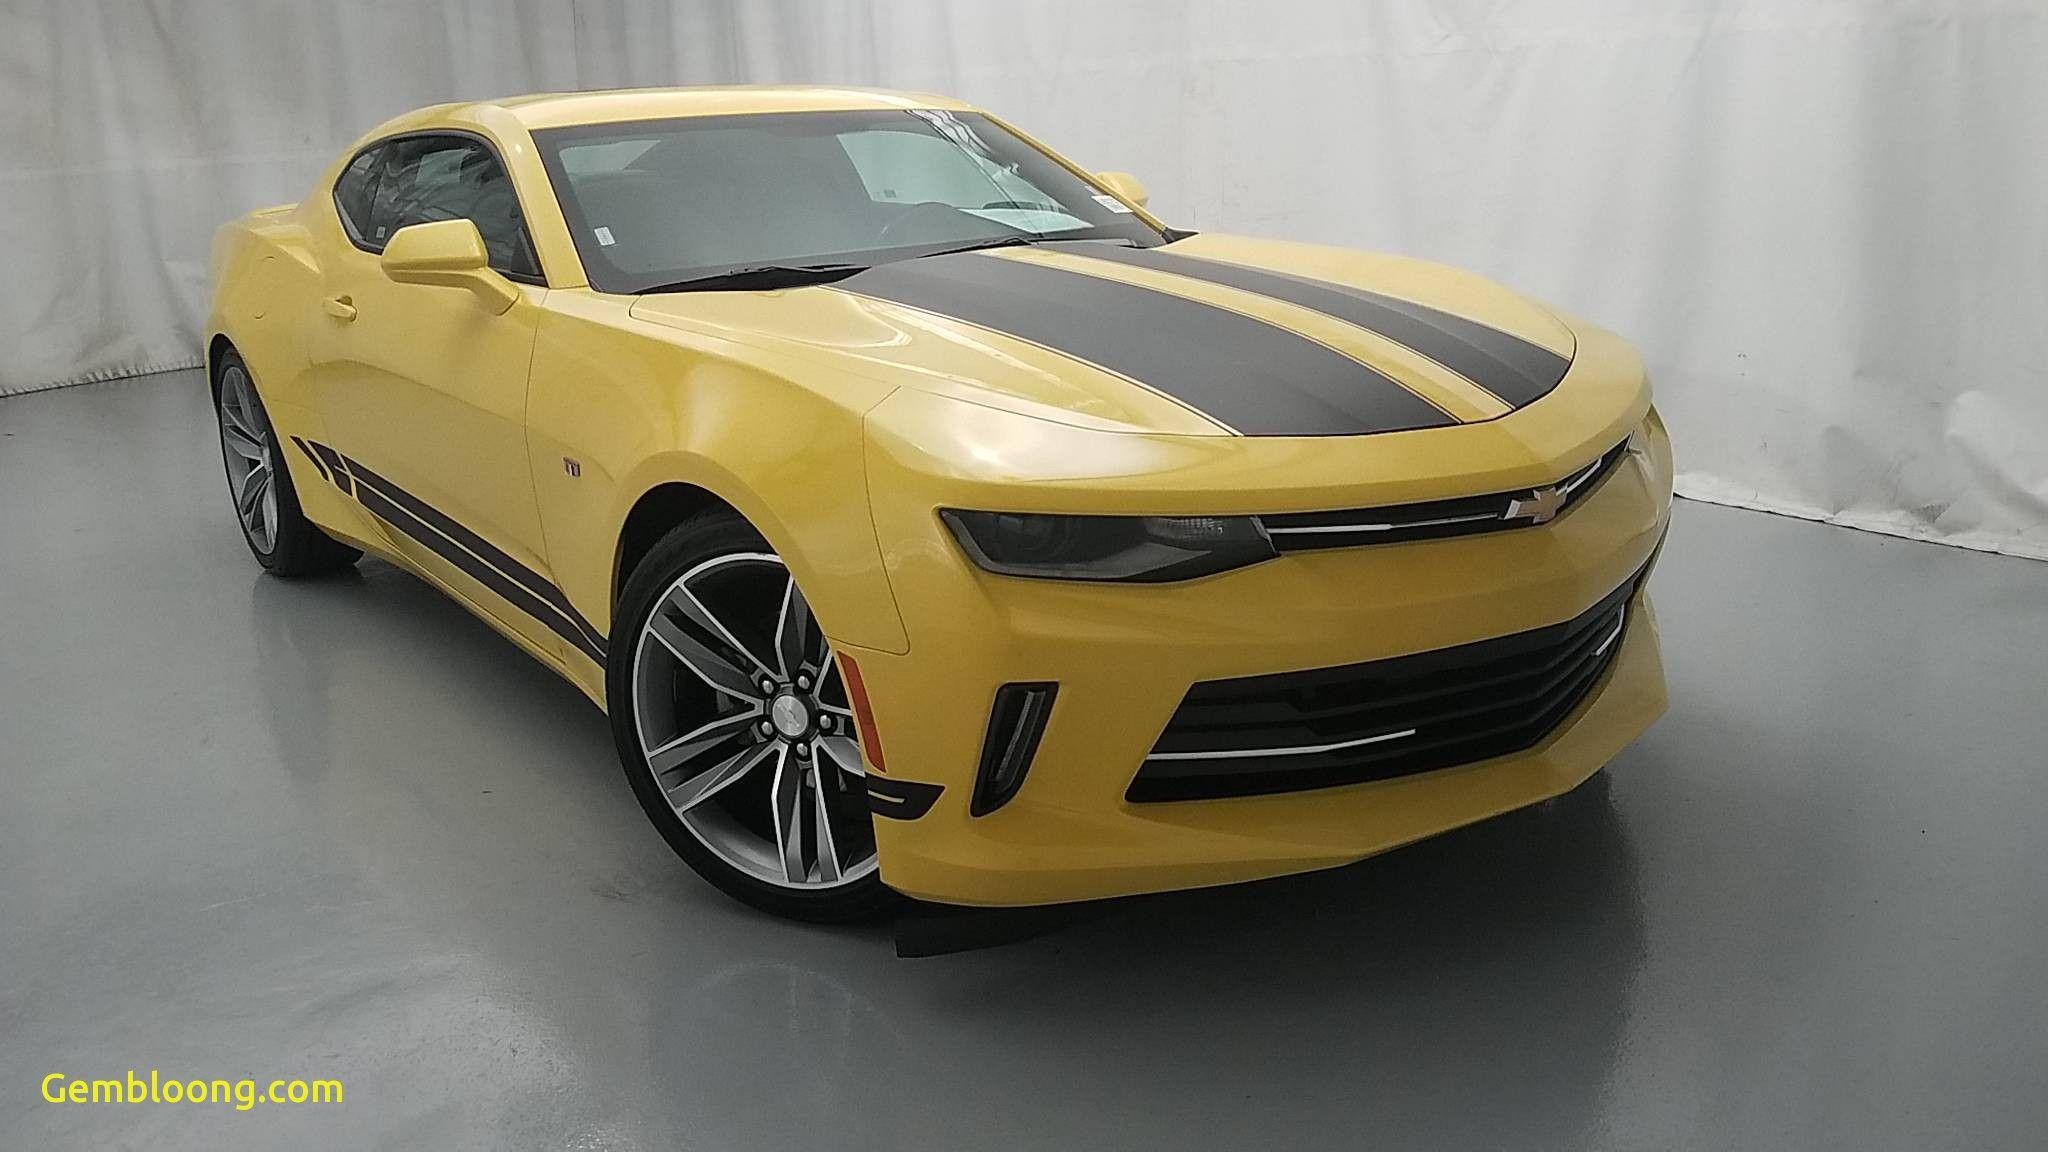 Luxury Cars For Sale Near Me Under 600 Automotive